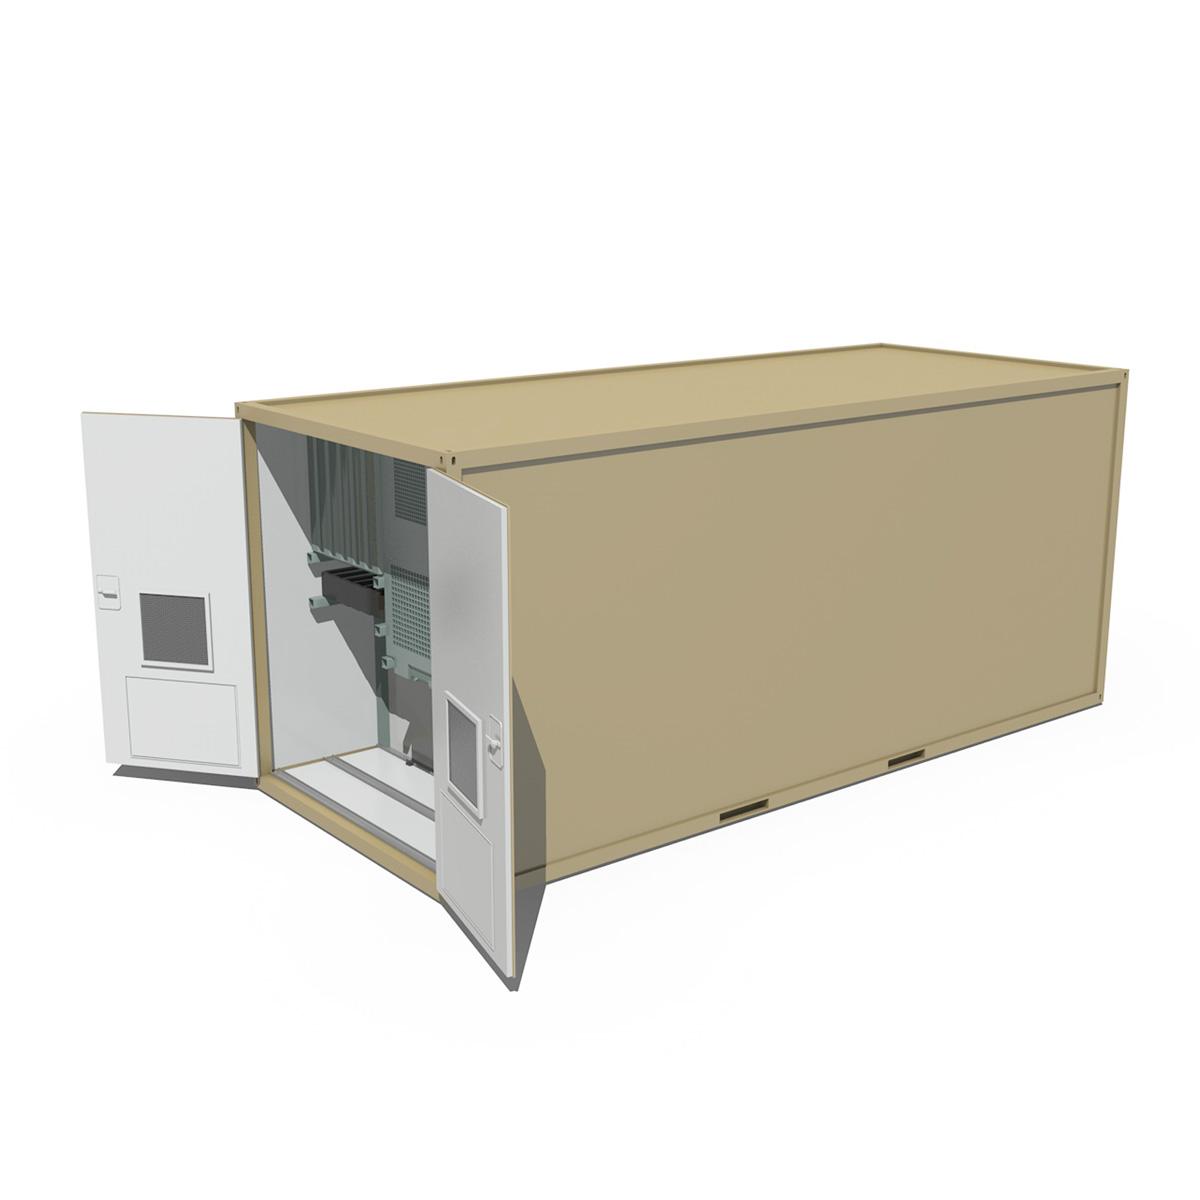 20ft office container version three 3d model 3ds fbx c4d lwo obj 252285